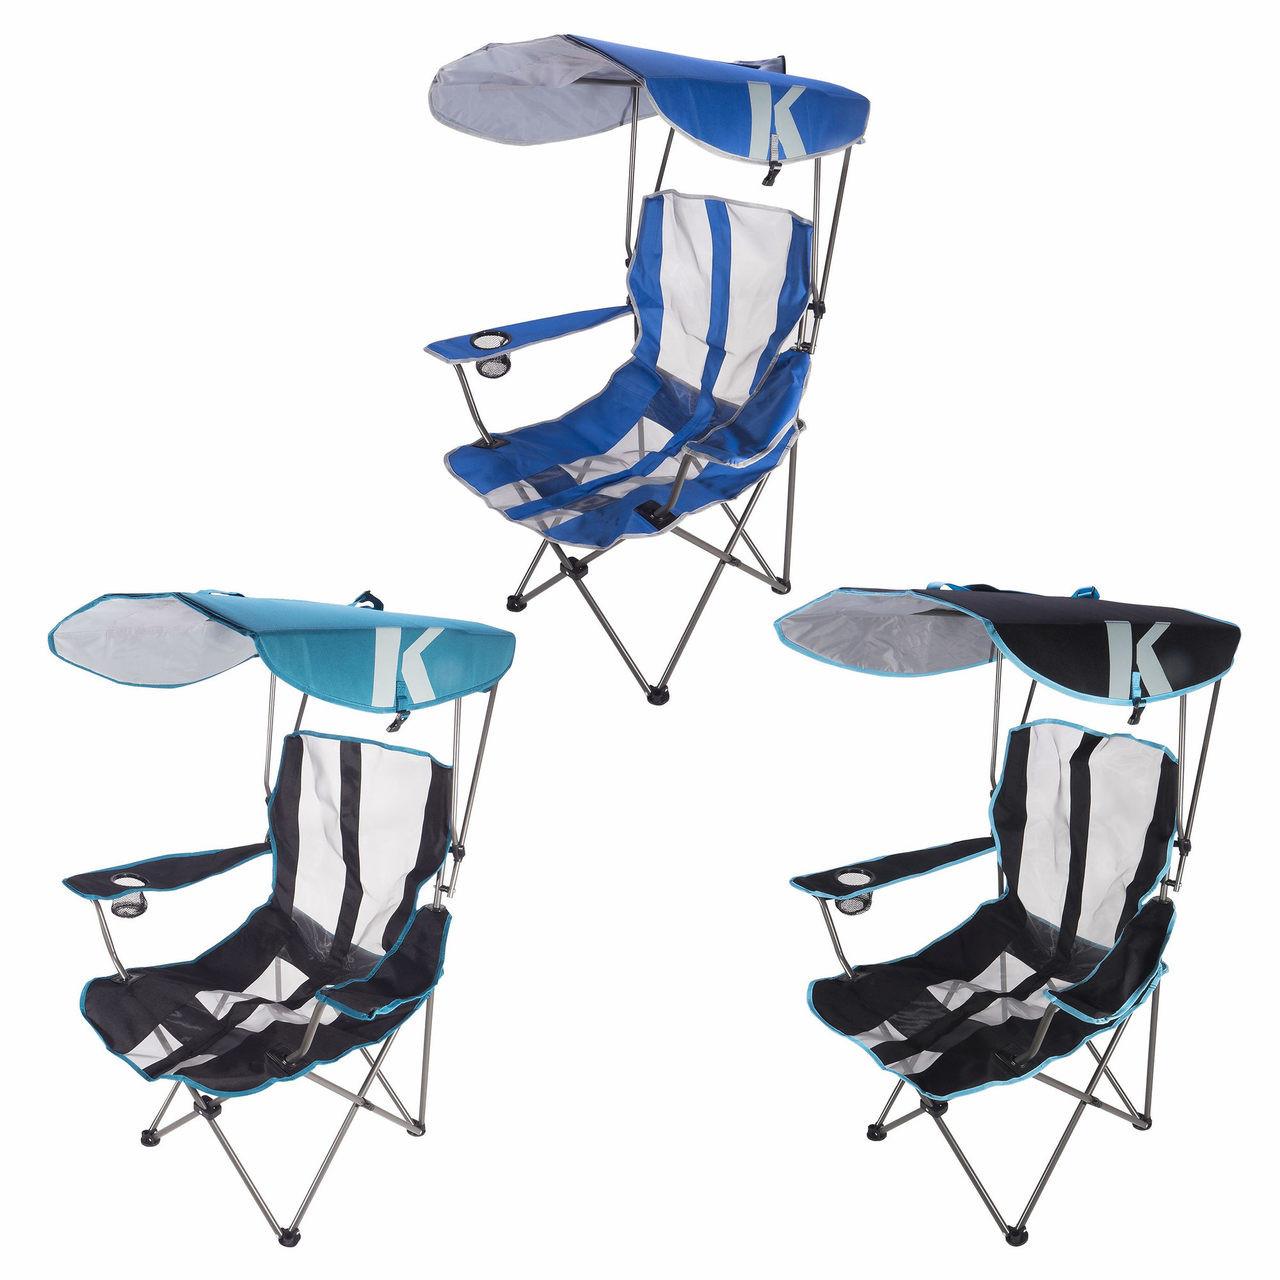 Admirable Kelsyus Original Canopy Chair Assorted 80186 Customarchery Wood Chair Design Ideas Customarcherynet